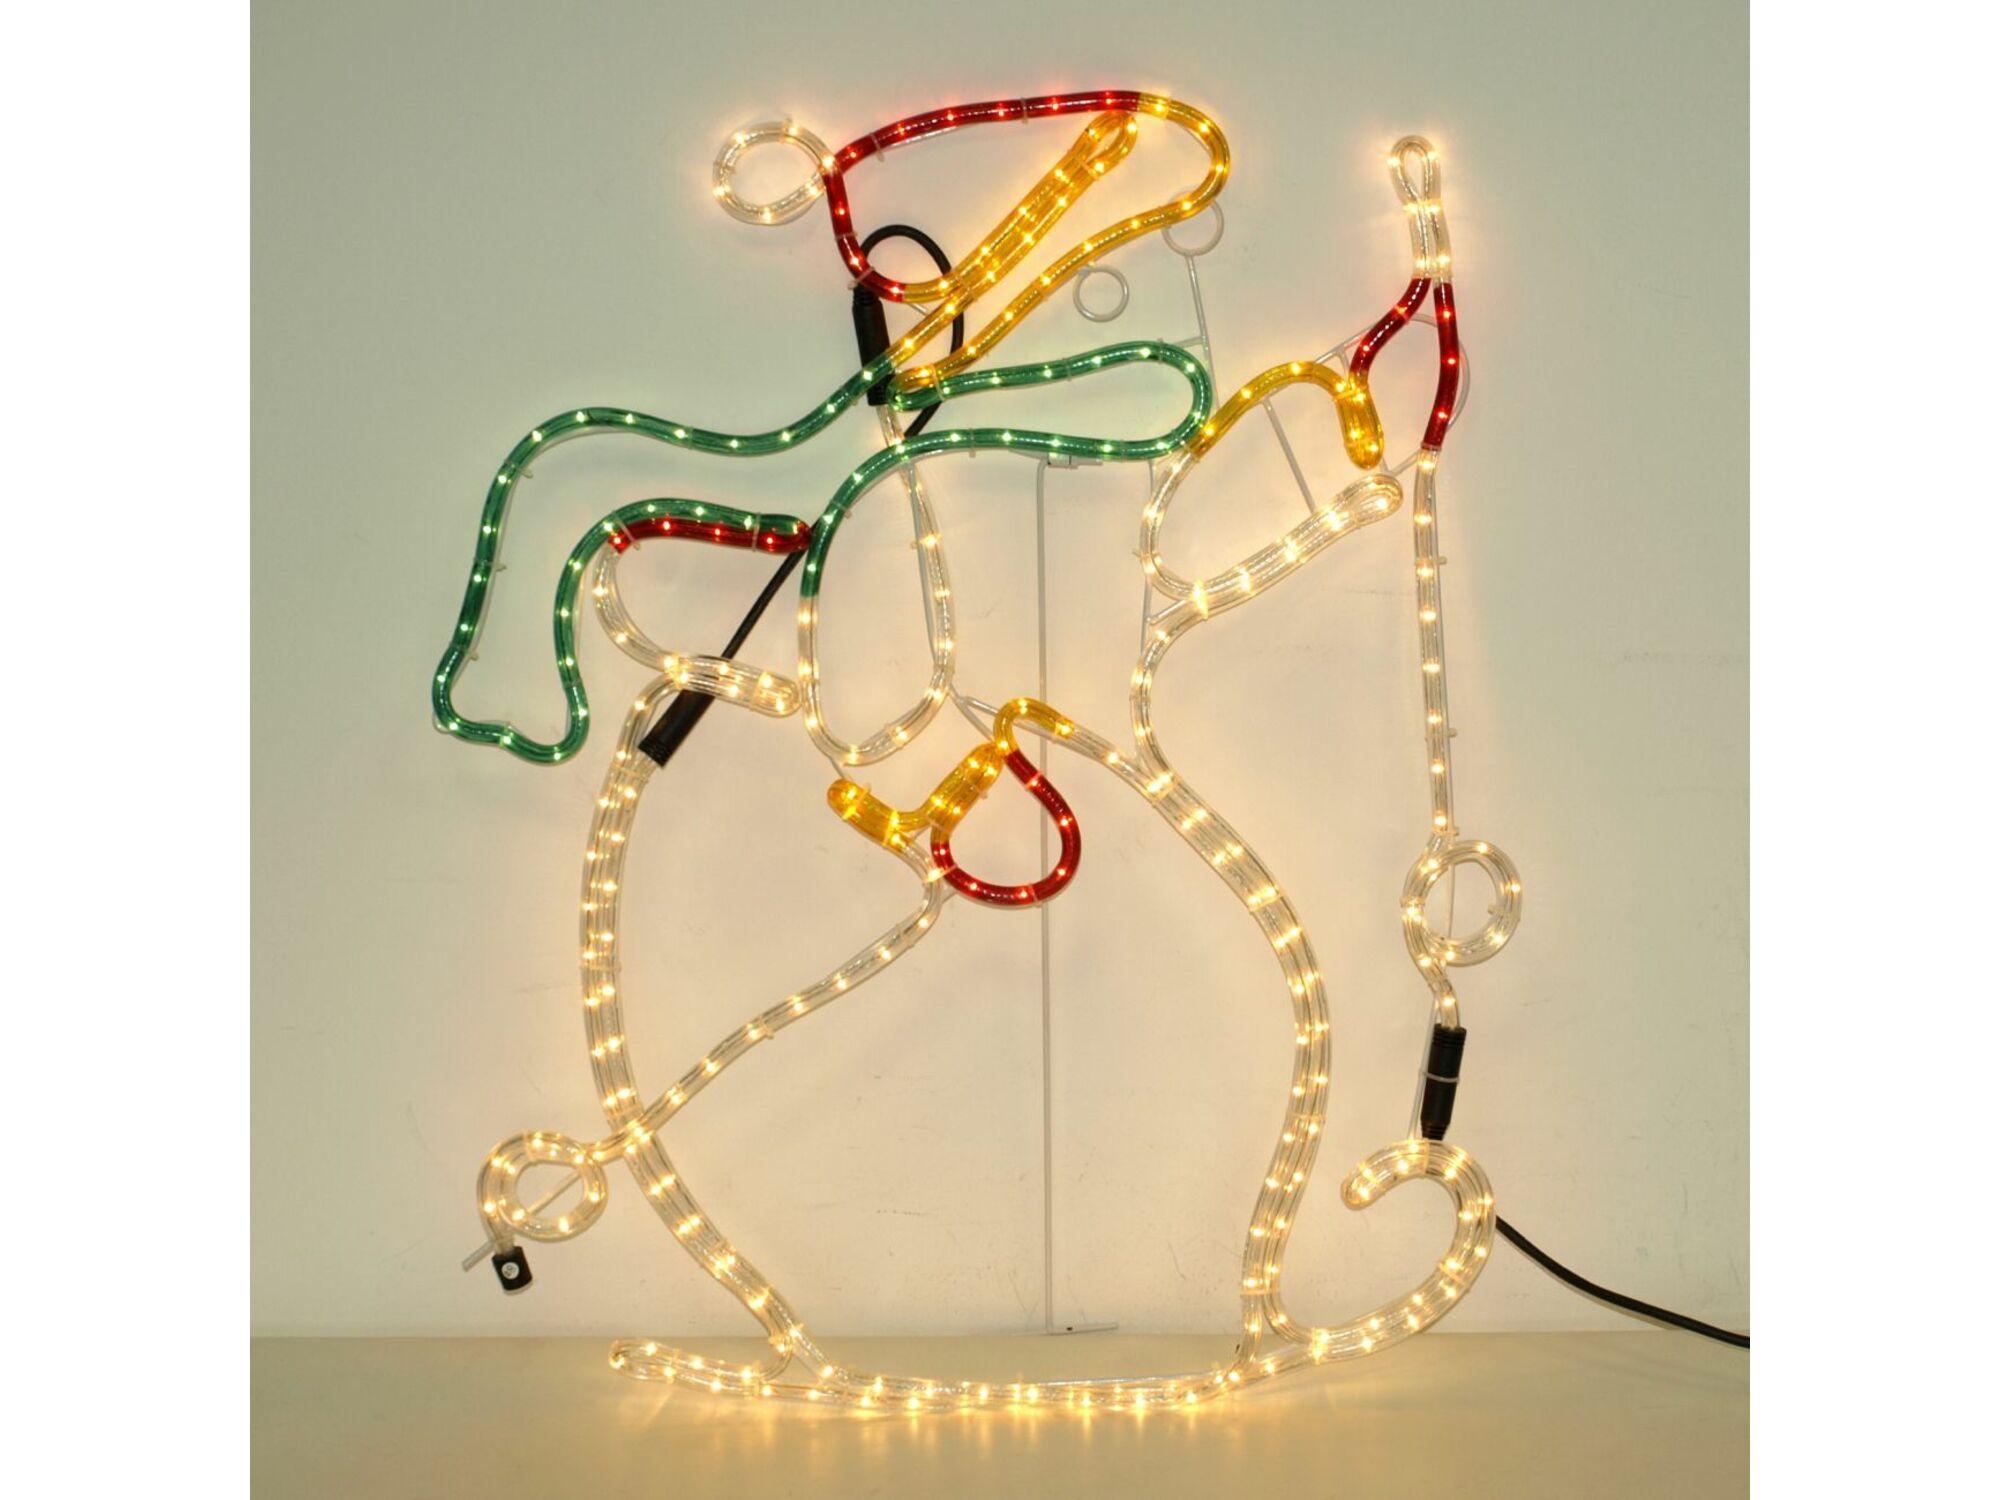 Božićni svetleći okvir 9m 52-203000